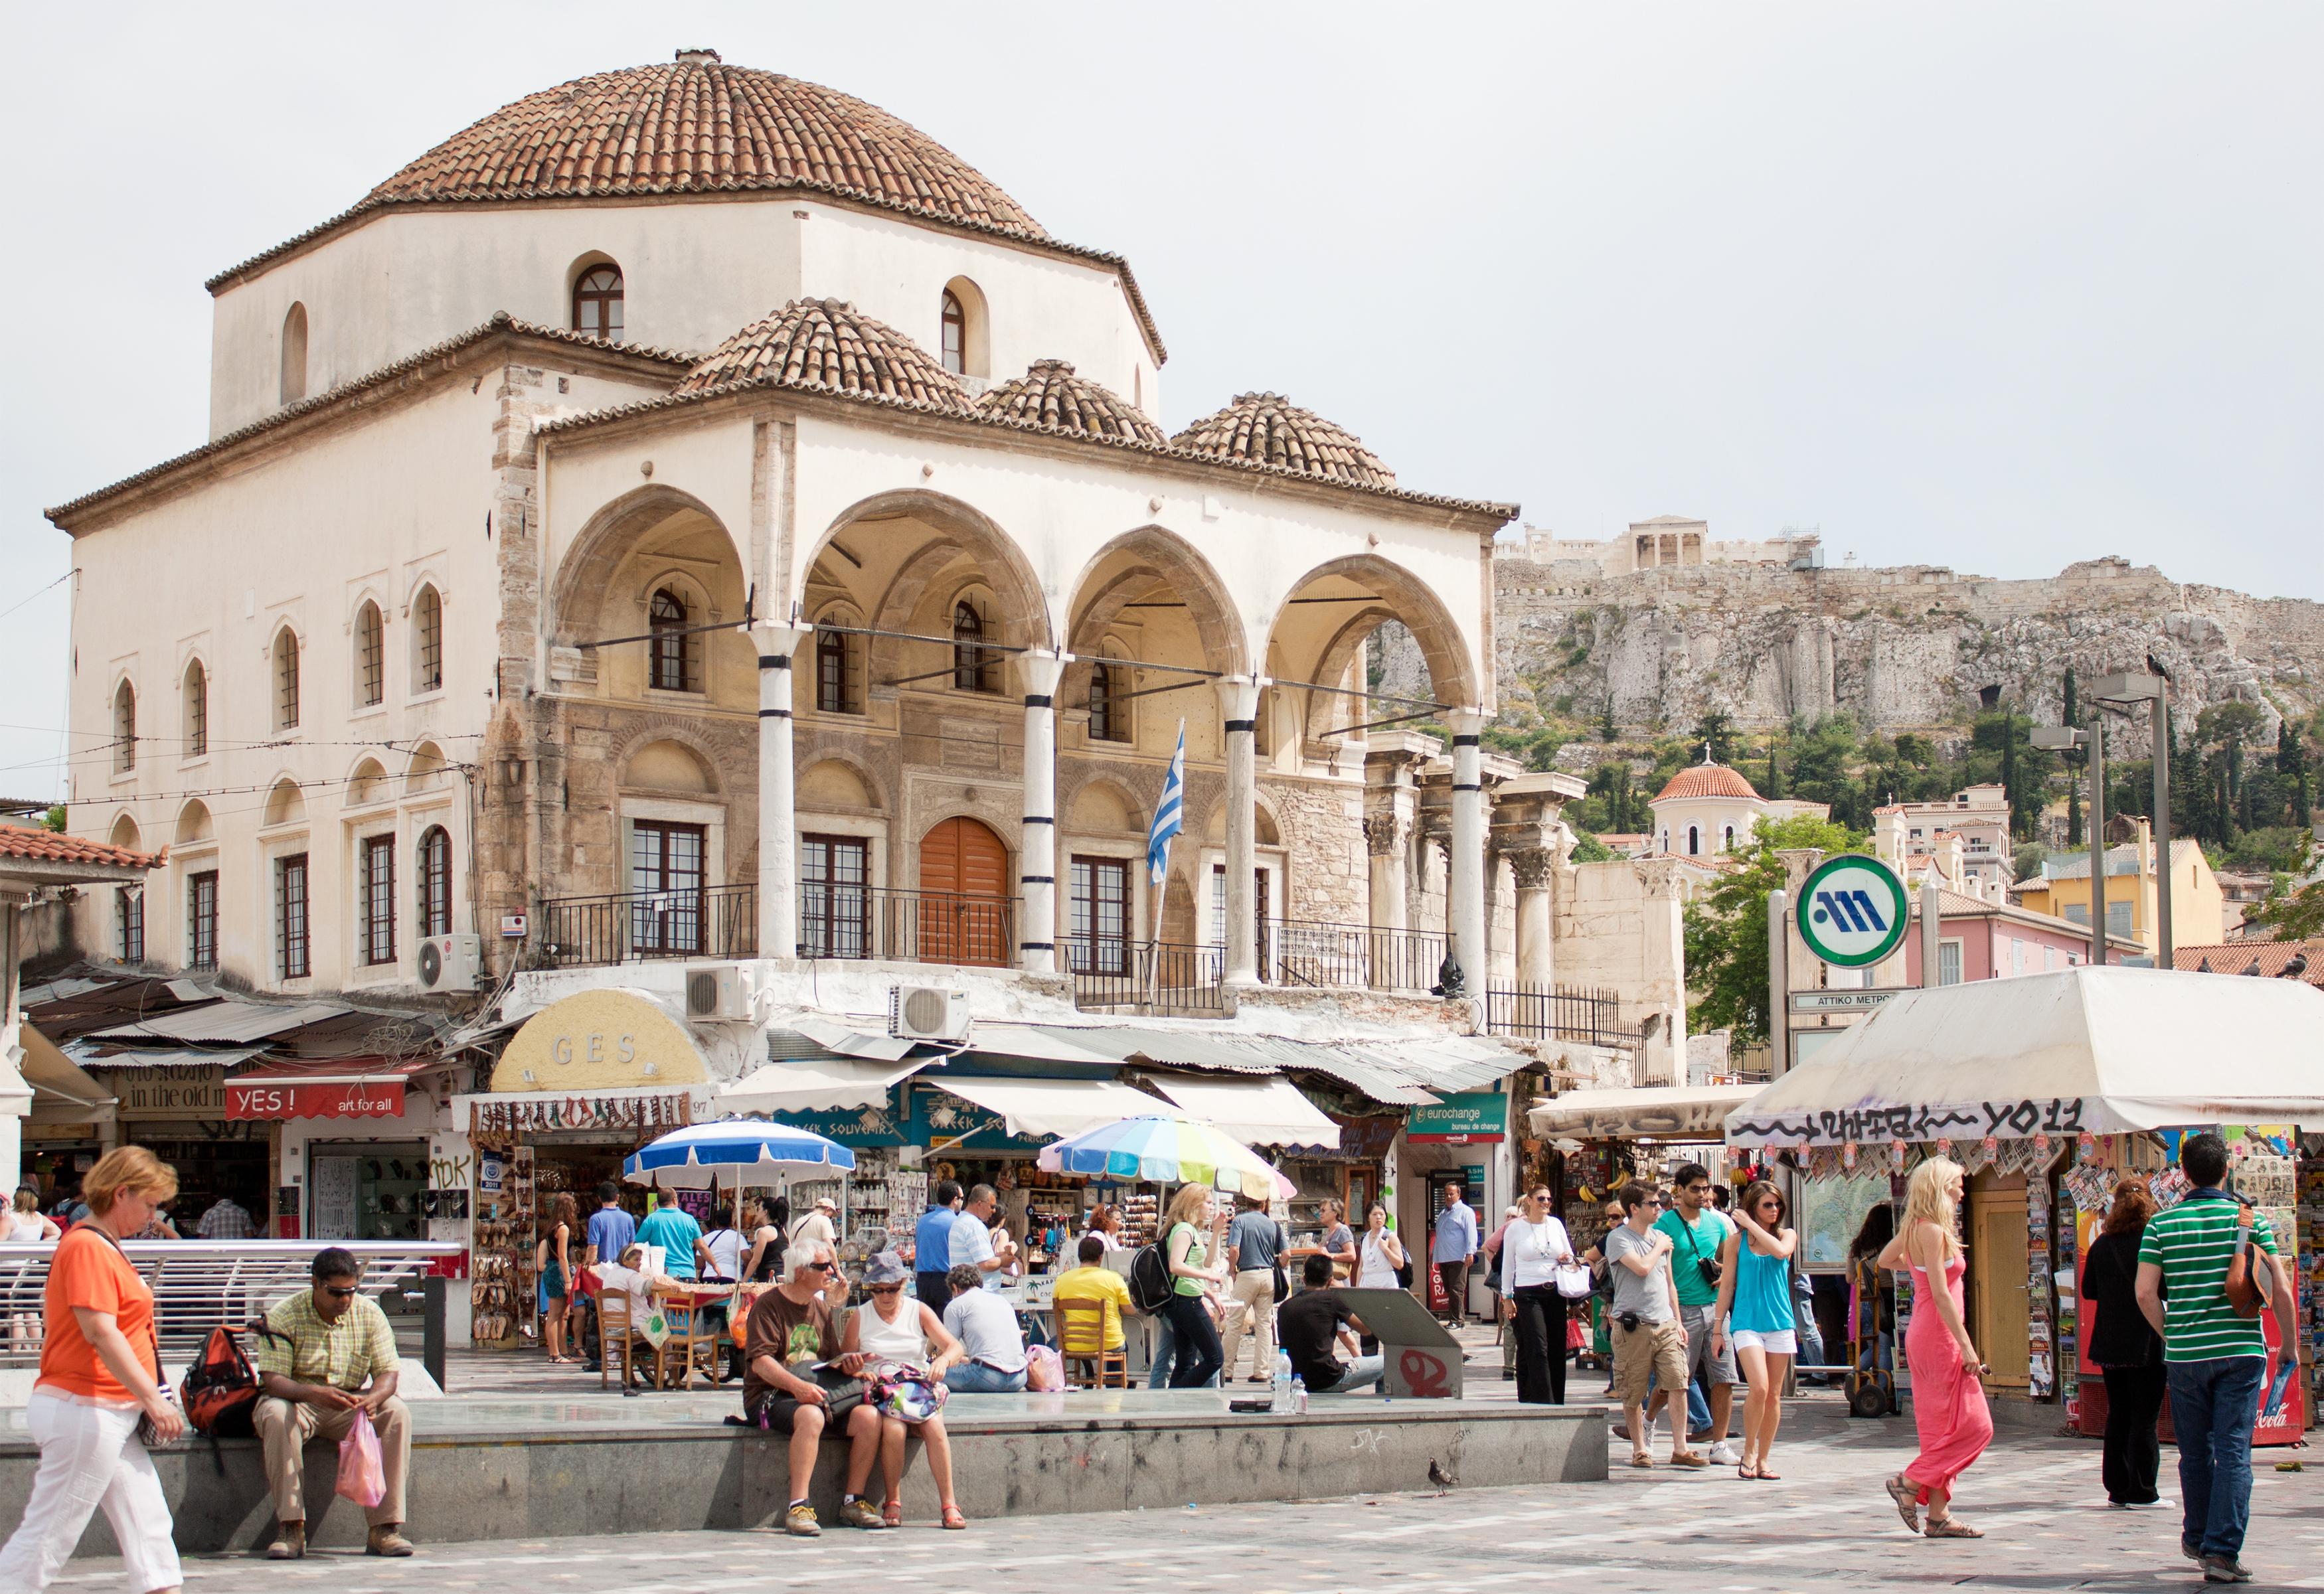 Circuito Grecia : Guía grecia circuito grecia clásica y santorini iberojet